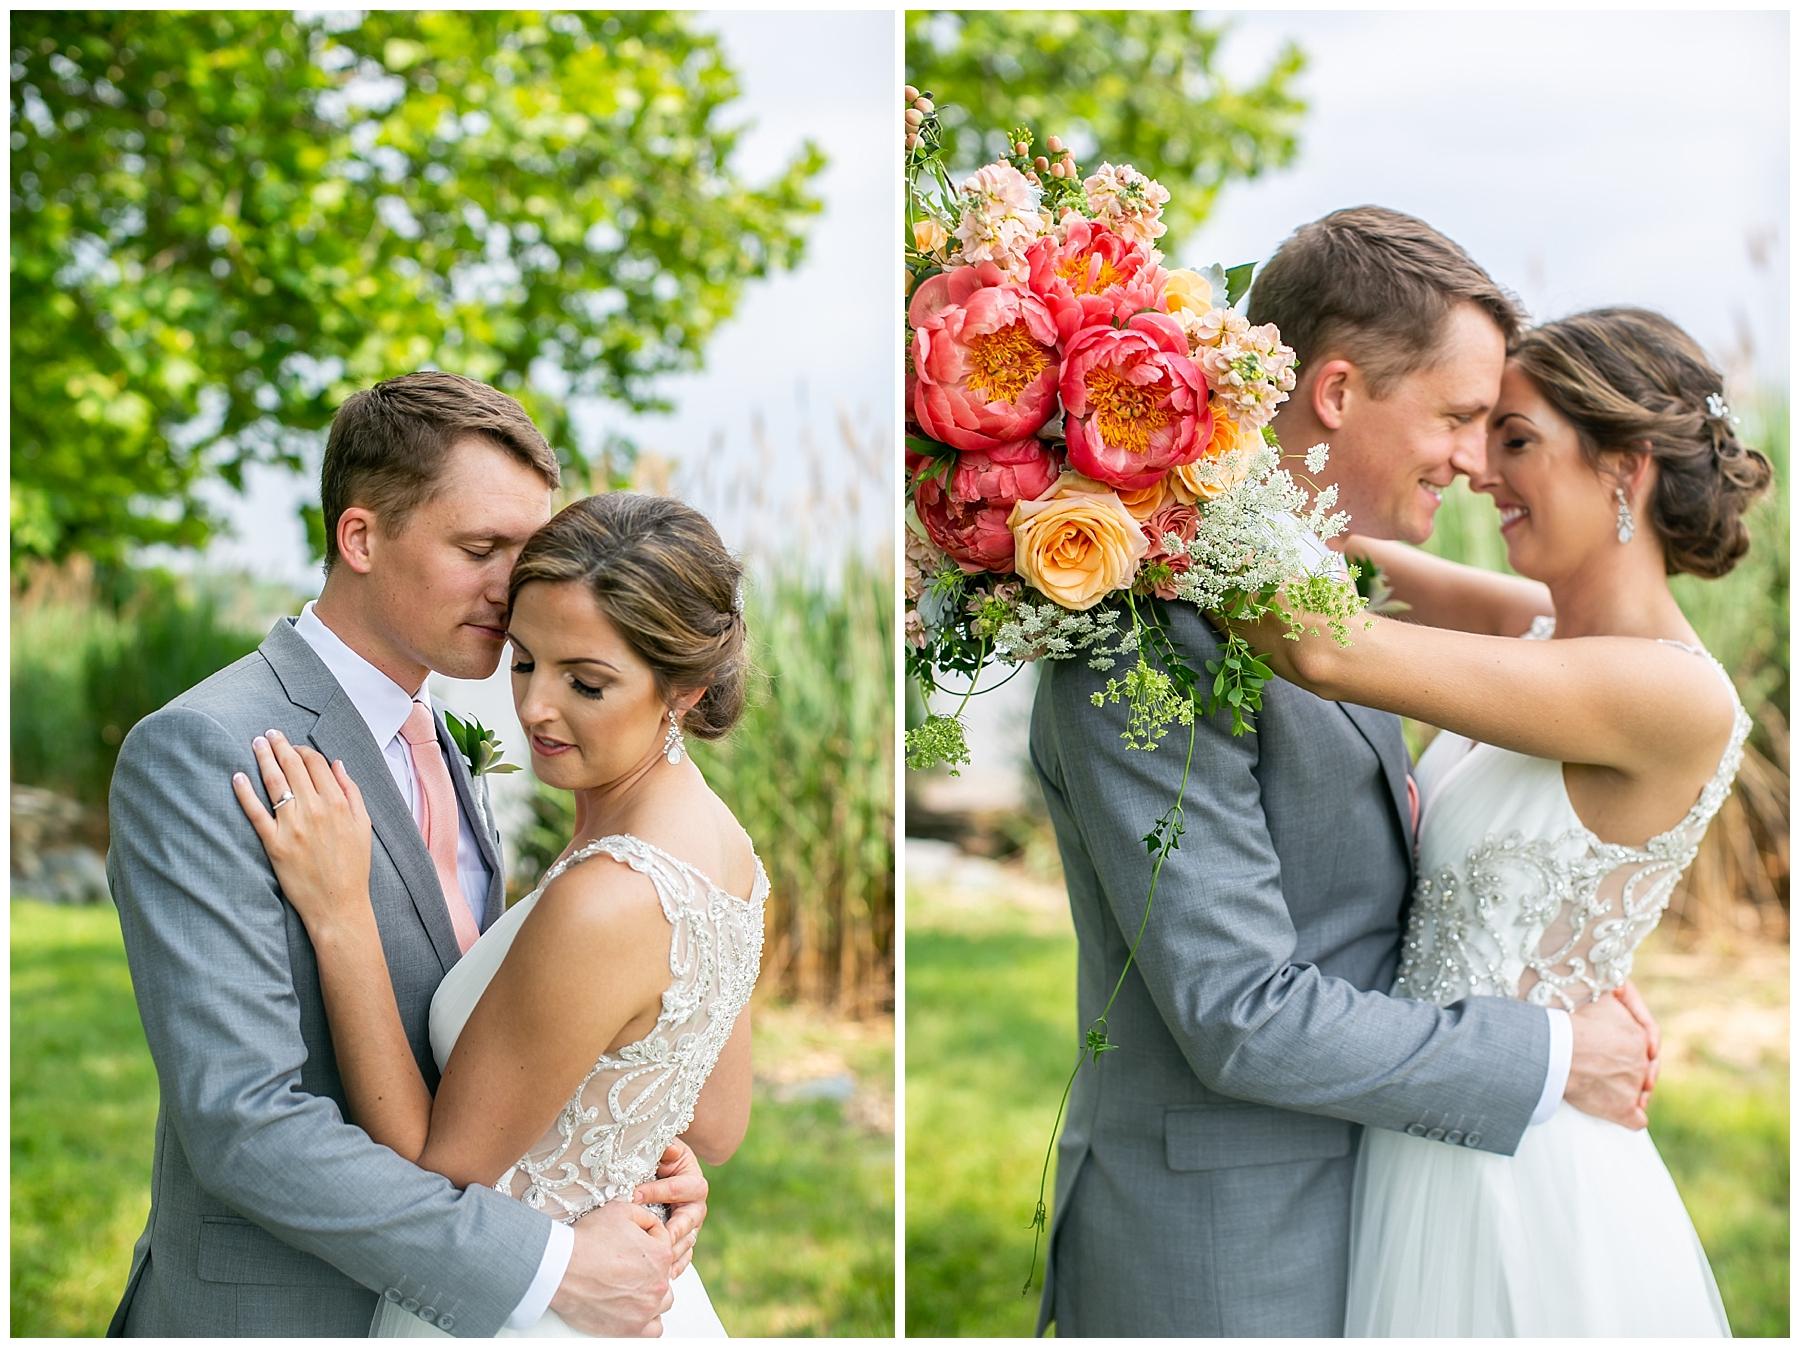 Chelsea Phil Bohemia River Overlook Wedding Living Radiant Photography photos_0038.jpg